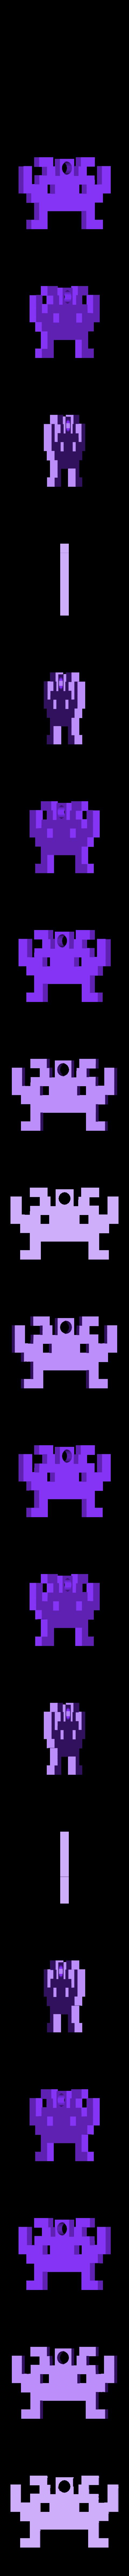 space_invader1.stl Download free STL file 8-bit space invader keychain • Design to 3D print, Durbanarb